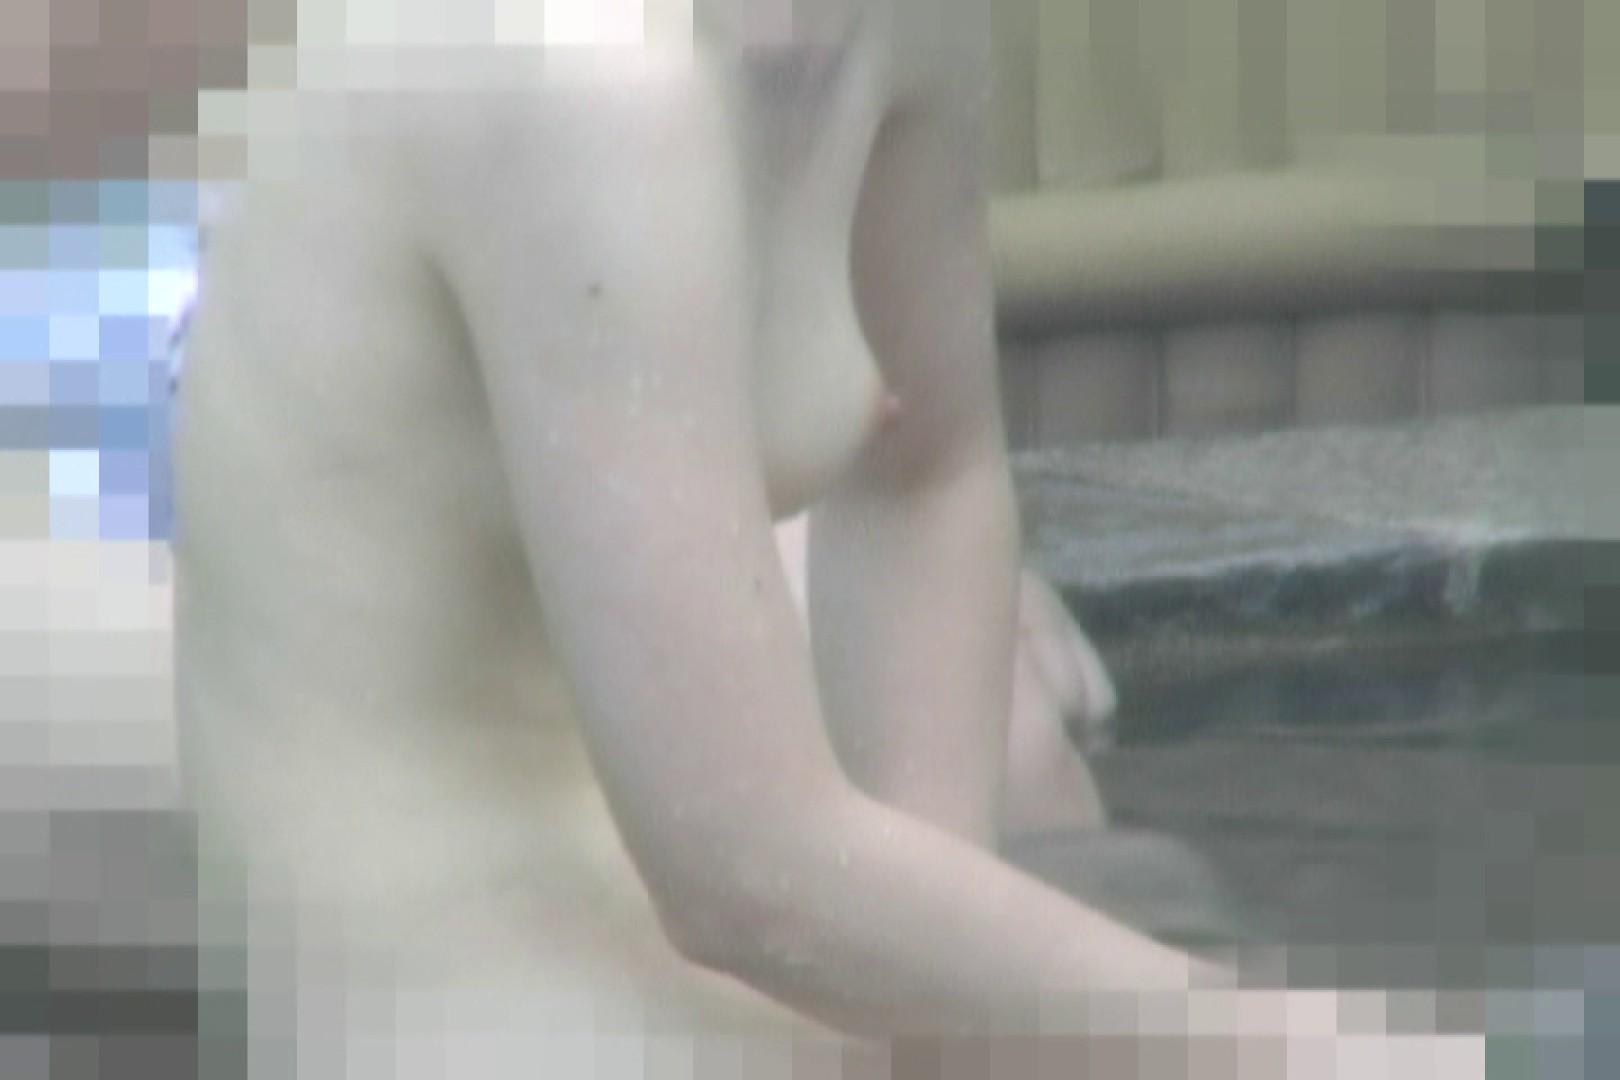 Aquaな露天風呂Vol.835 盗撮シリーズ   露天風呂編  92PIX 69